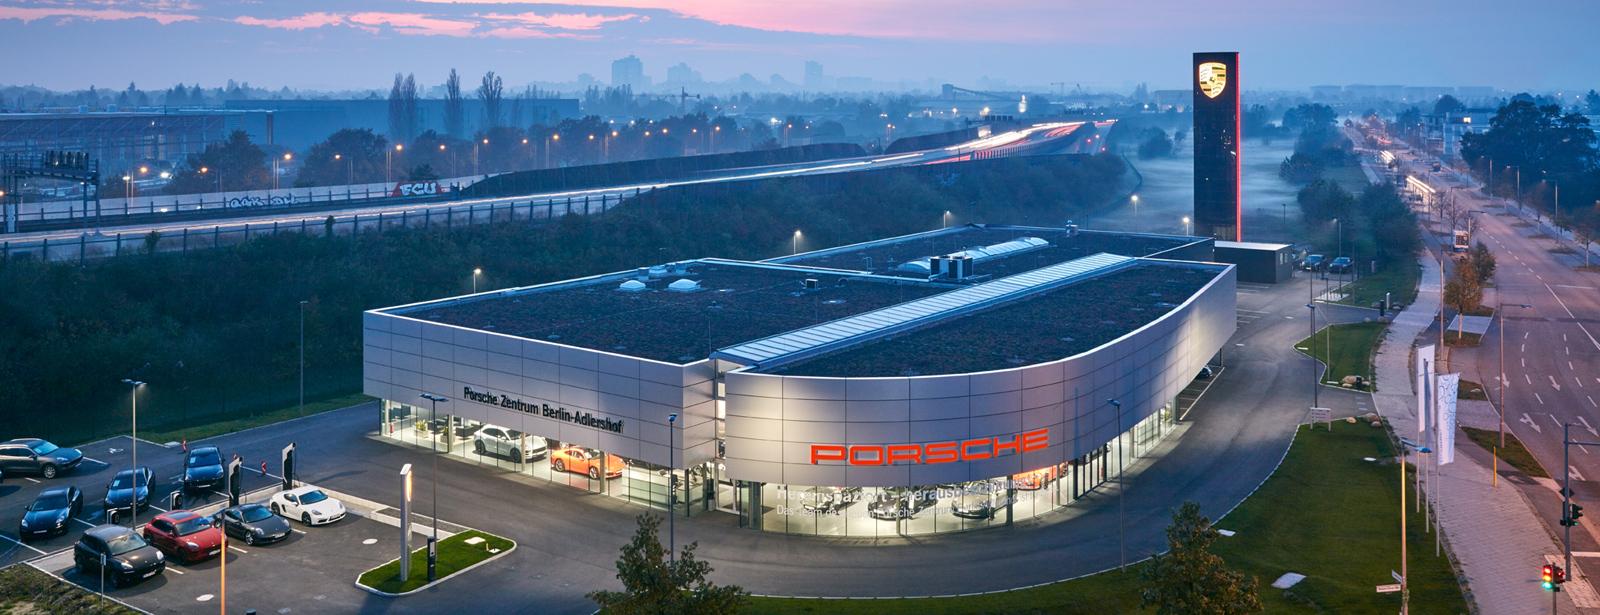 Unser Partner | PZ Berlin-Adlershof